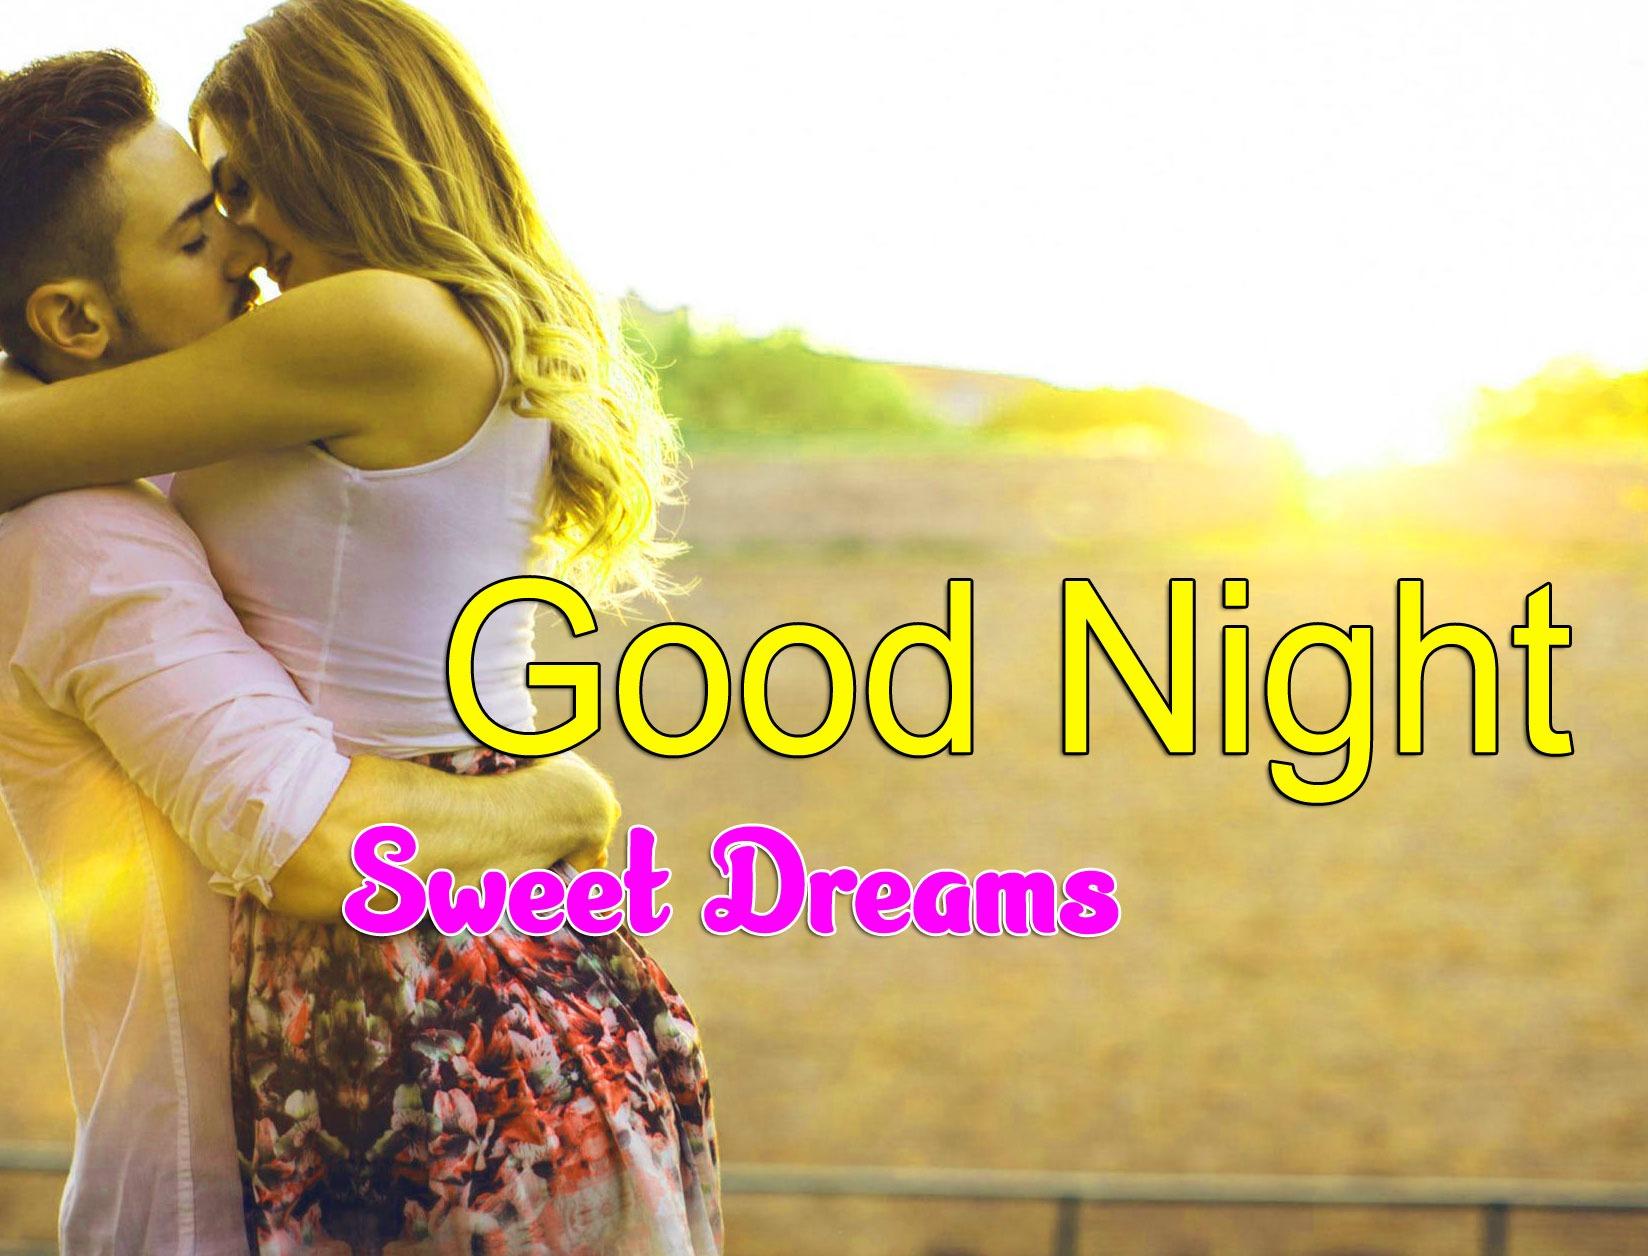 Girlfriend Good Night Wishes Wallpaper Download